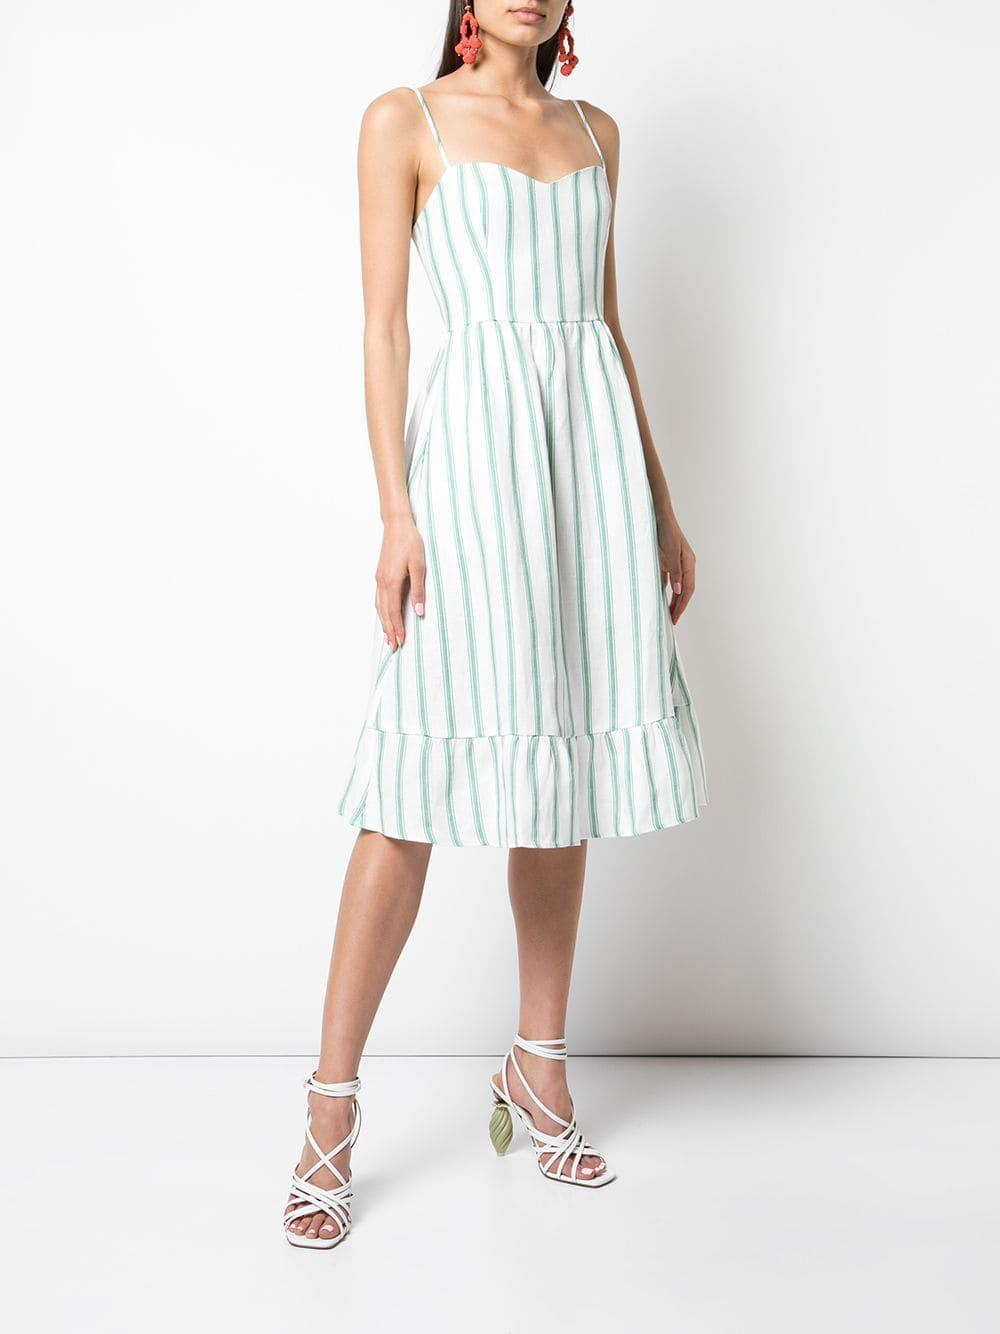 5f88104c9af Lyst - Reformation Eileen Striped Dress in White